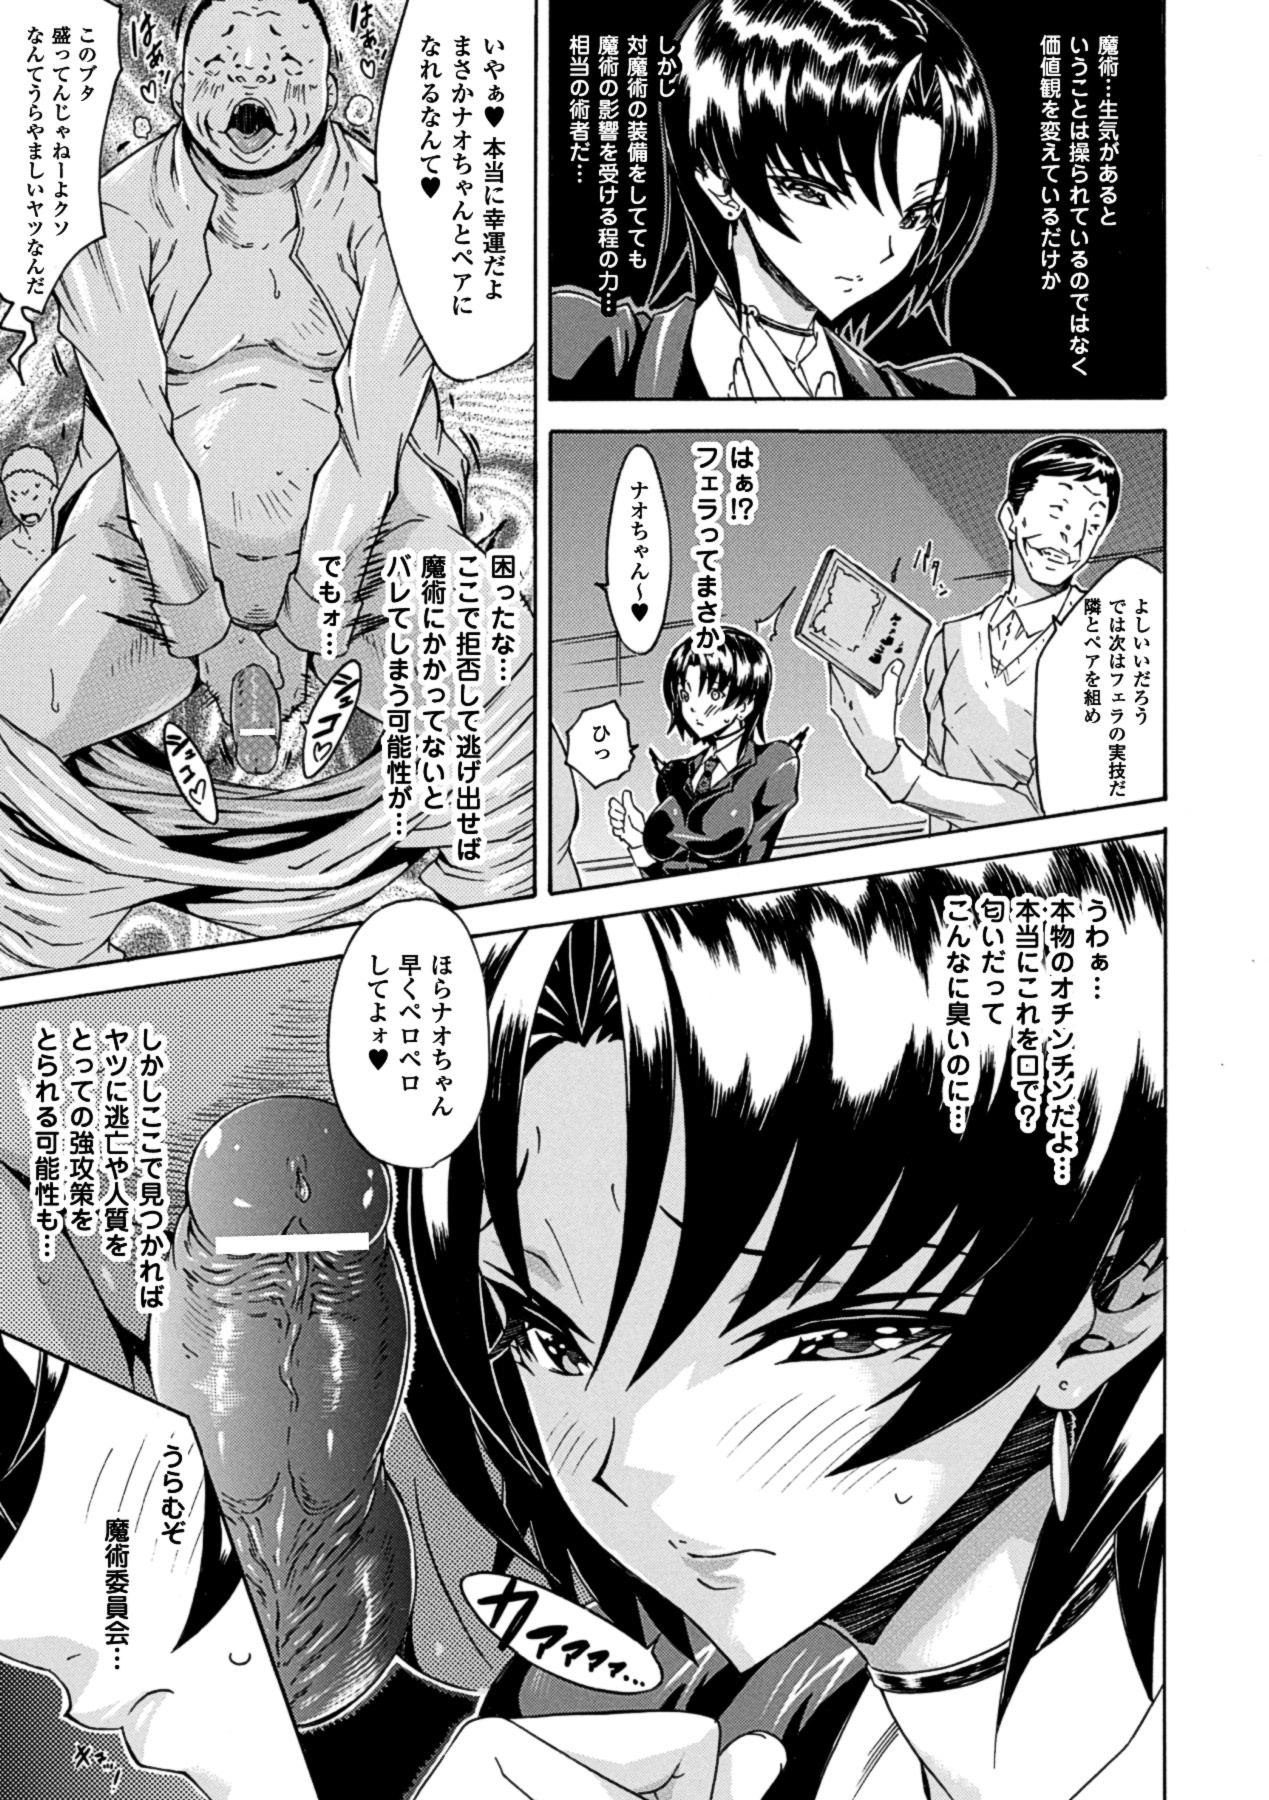 Megami Crisis 10 158